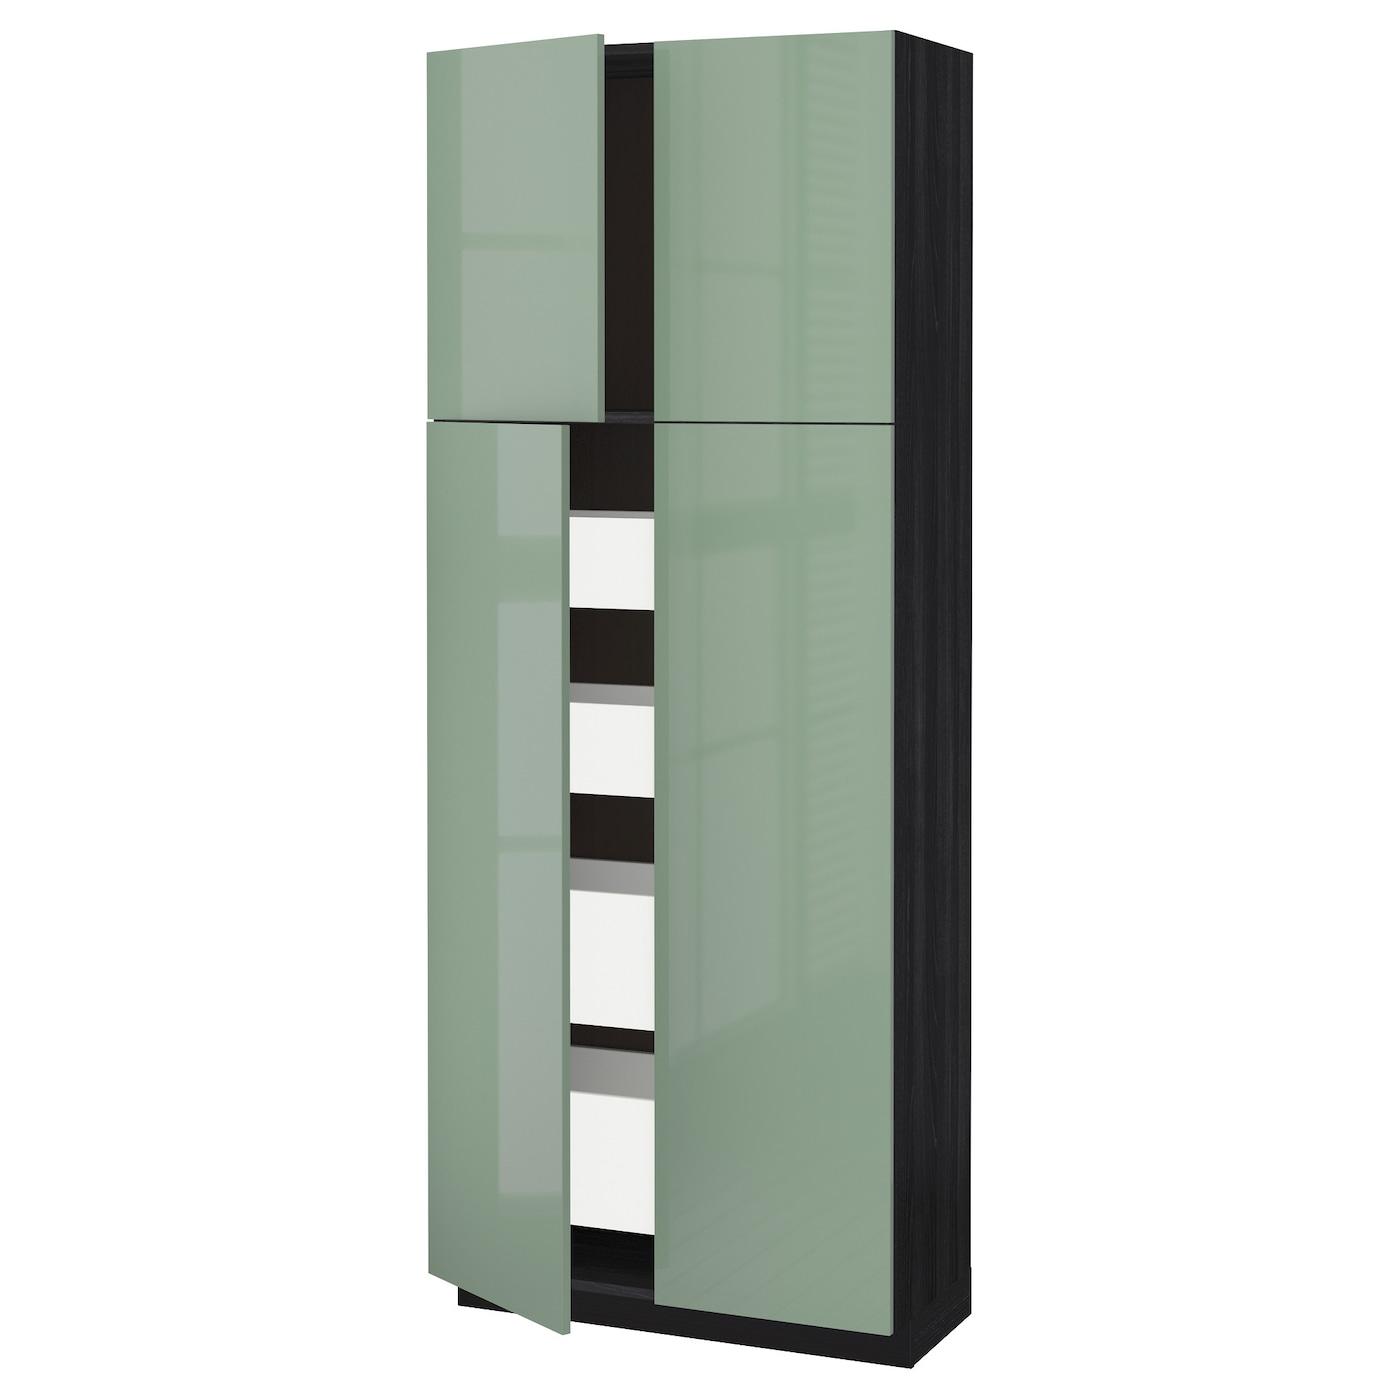 metod maximera armoire 4 portes 4 tirois noir kallarp vert clair 80x37x200 cm ikea. Black Bedroom Furniture Sets. Home Design Ideas